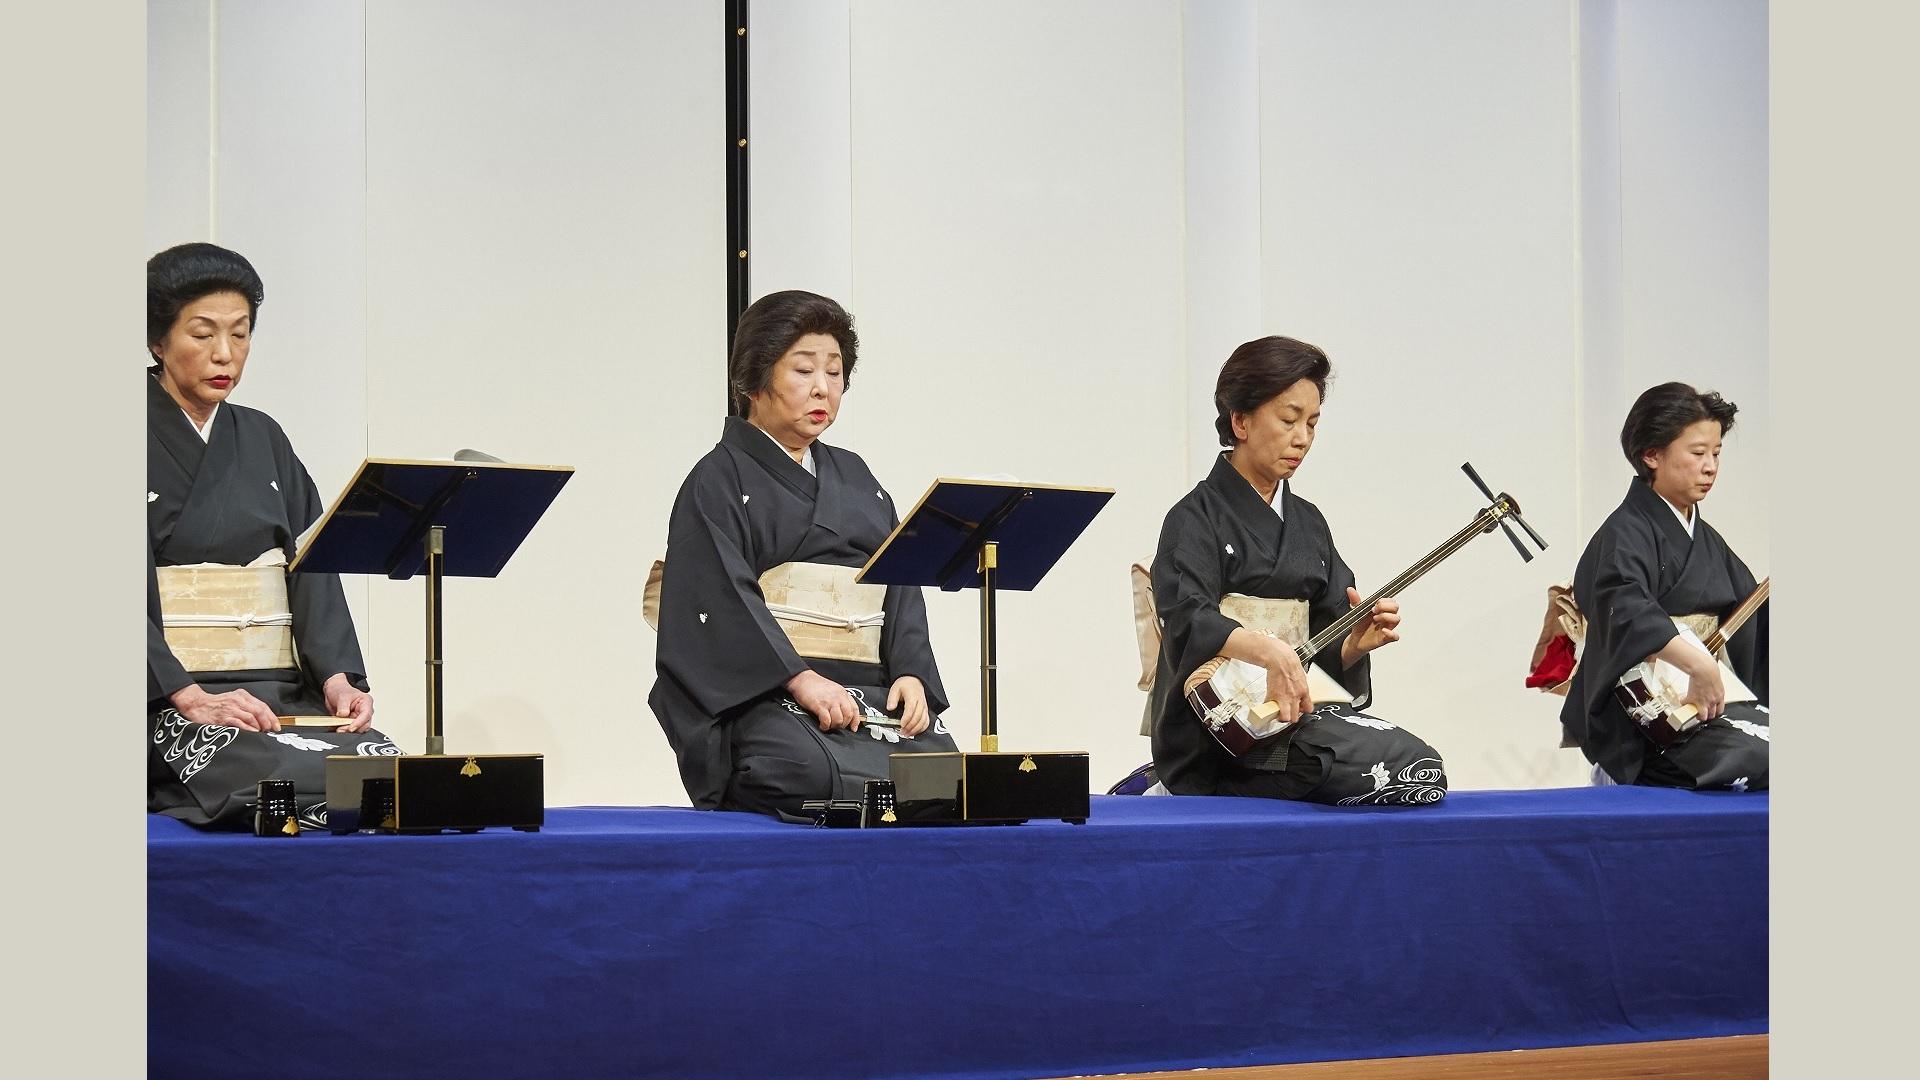 江戸三味線音楽の変遷 第7回 美意識の発露